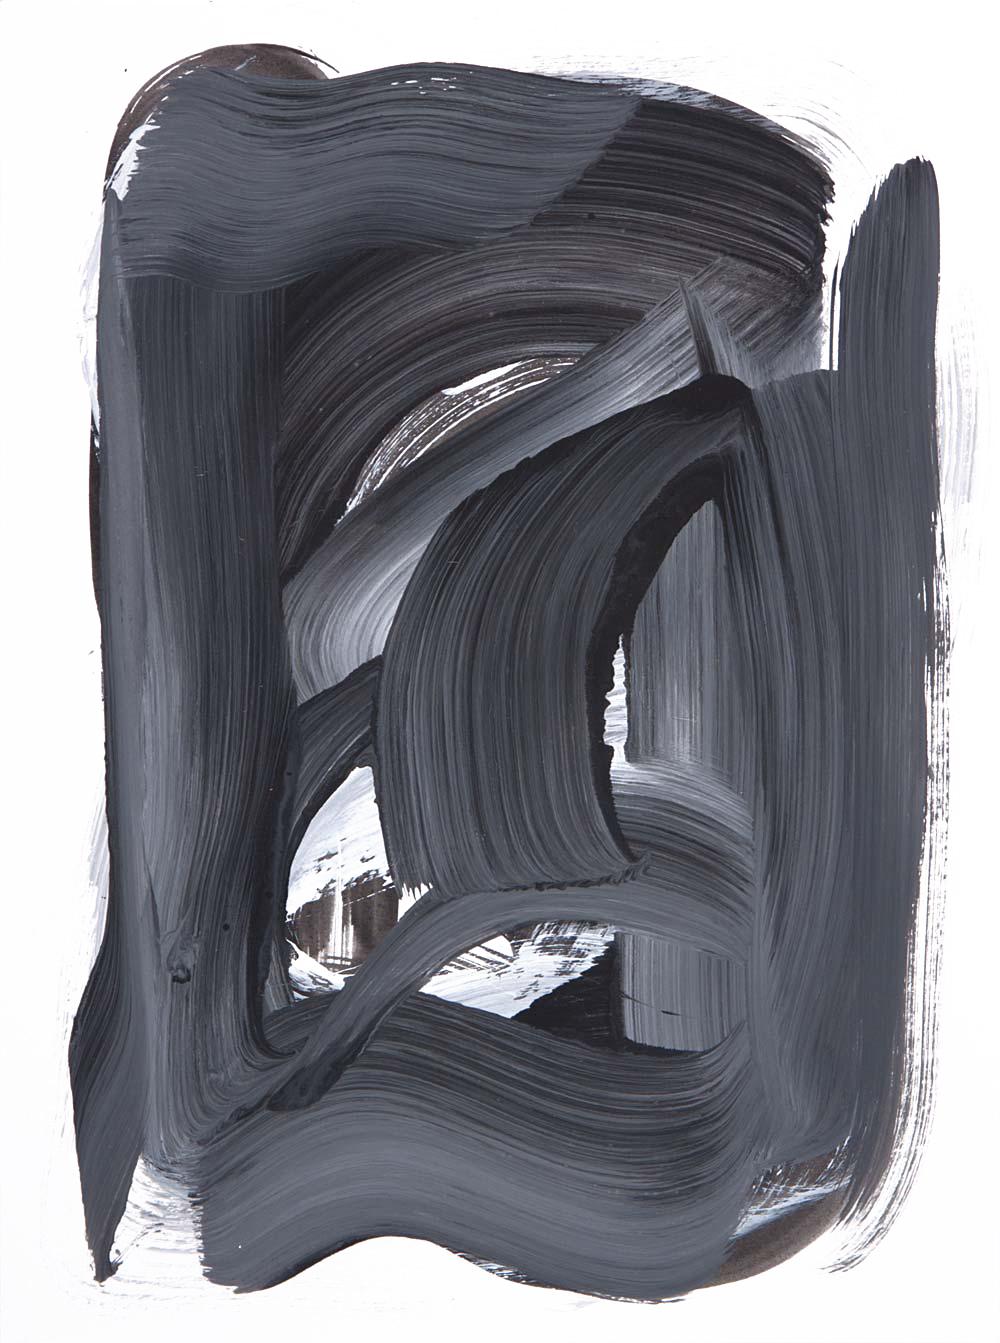 Wiseguy 5 , 2017 Acrylic 12 x 9 in.